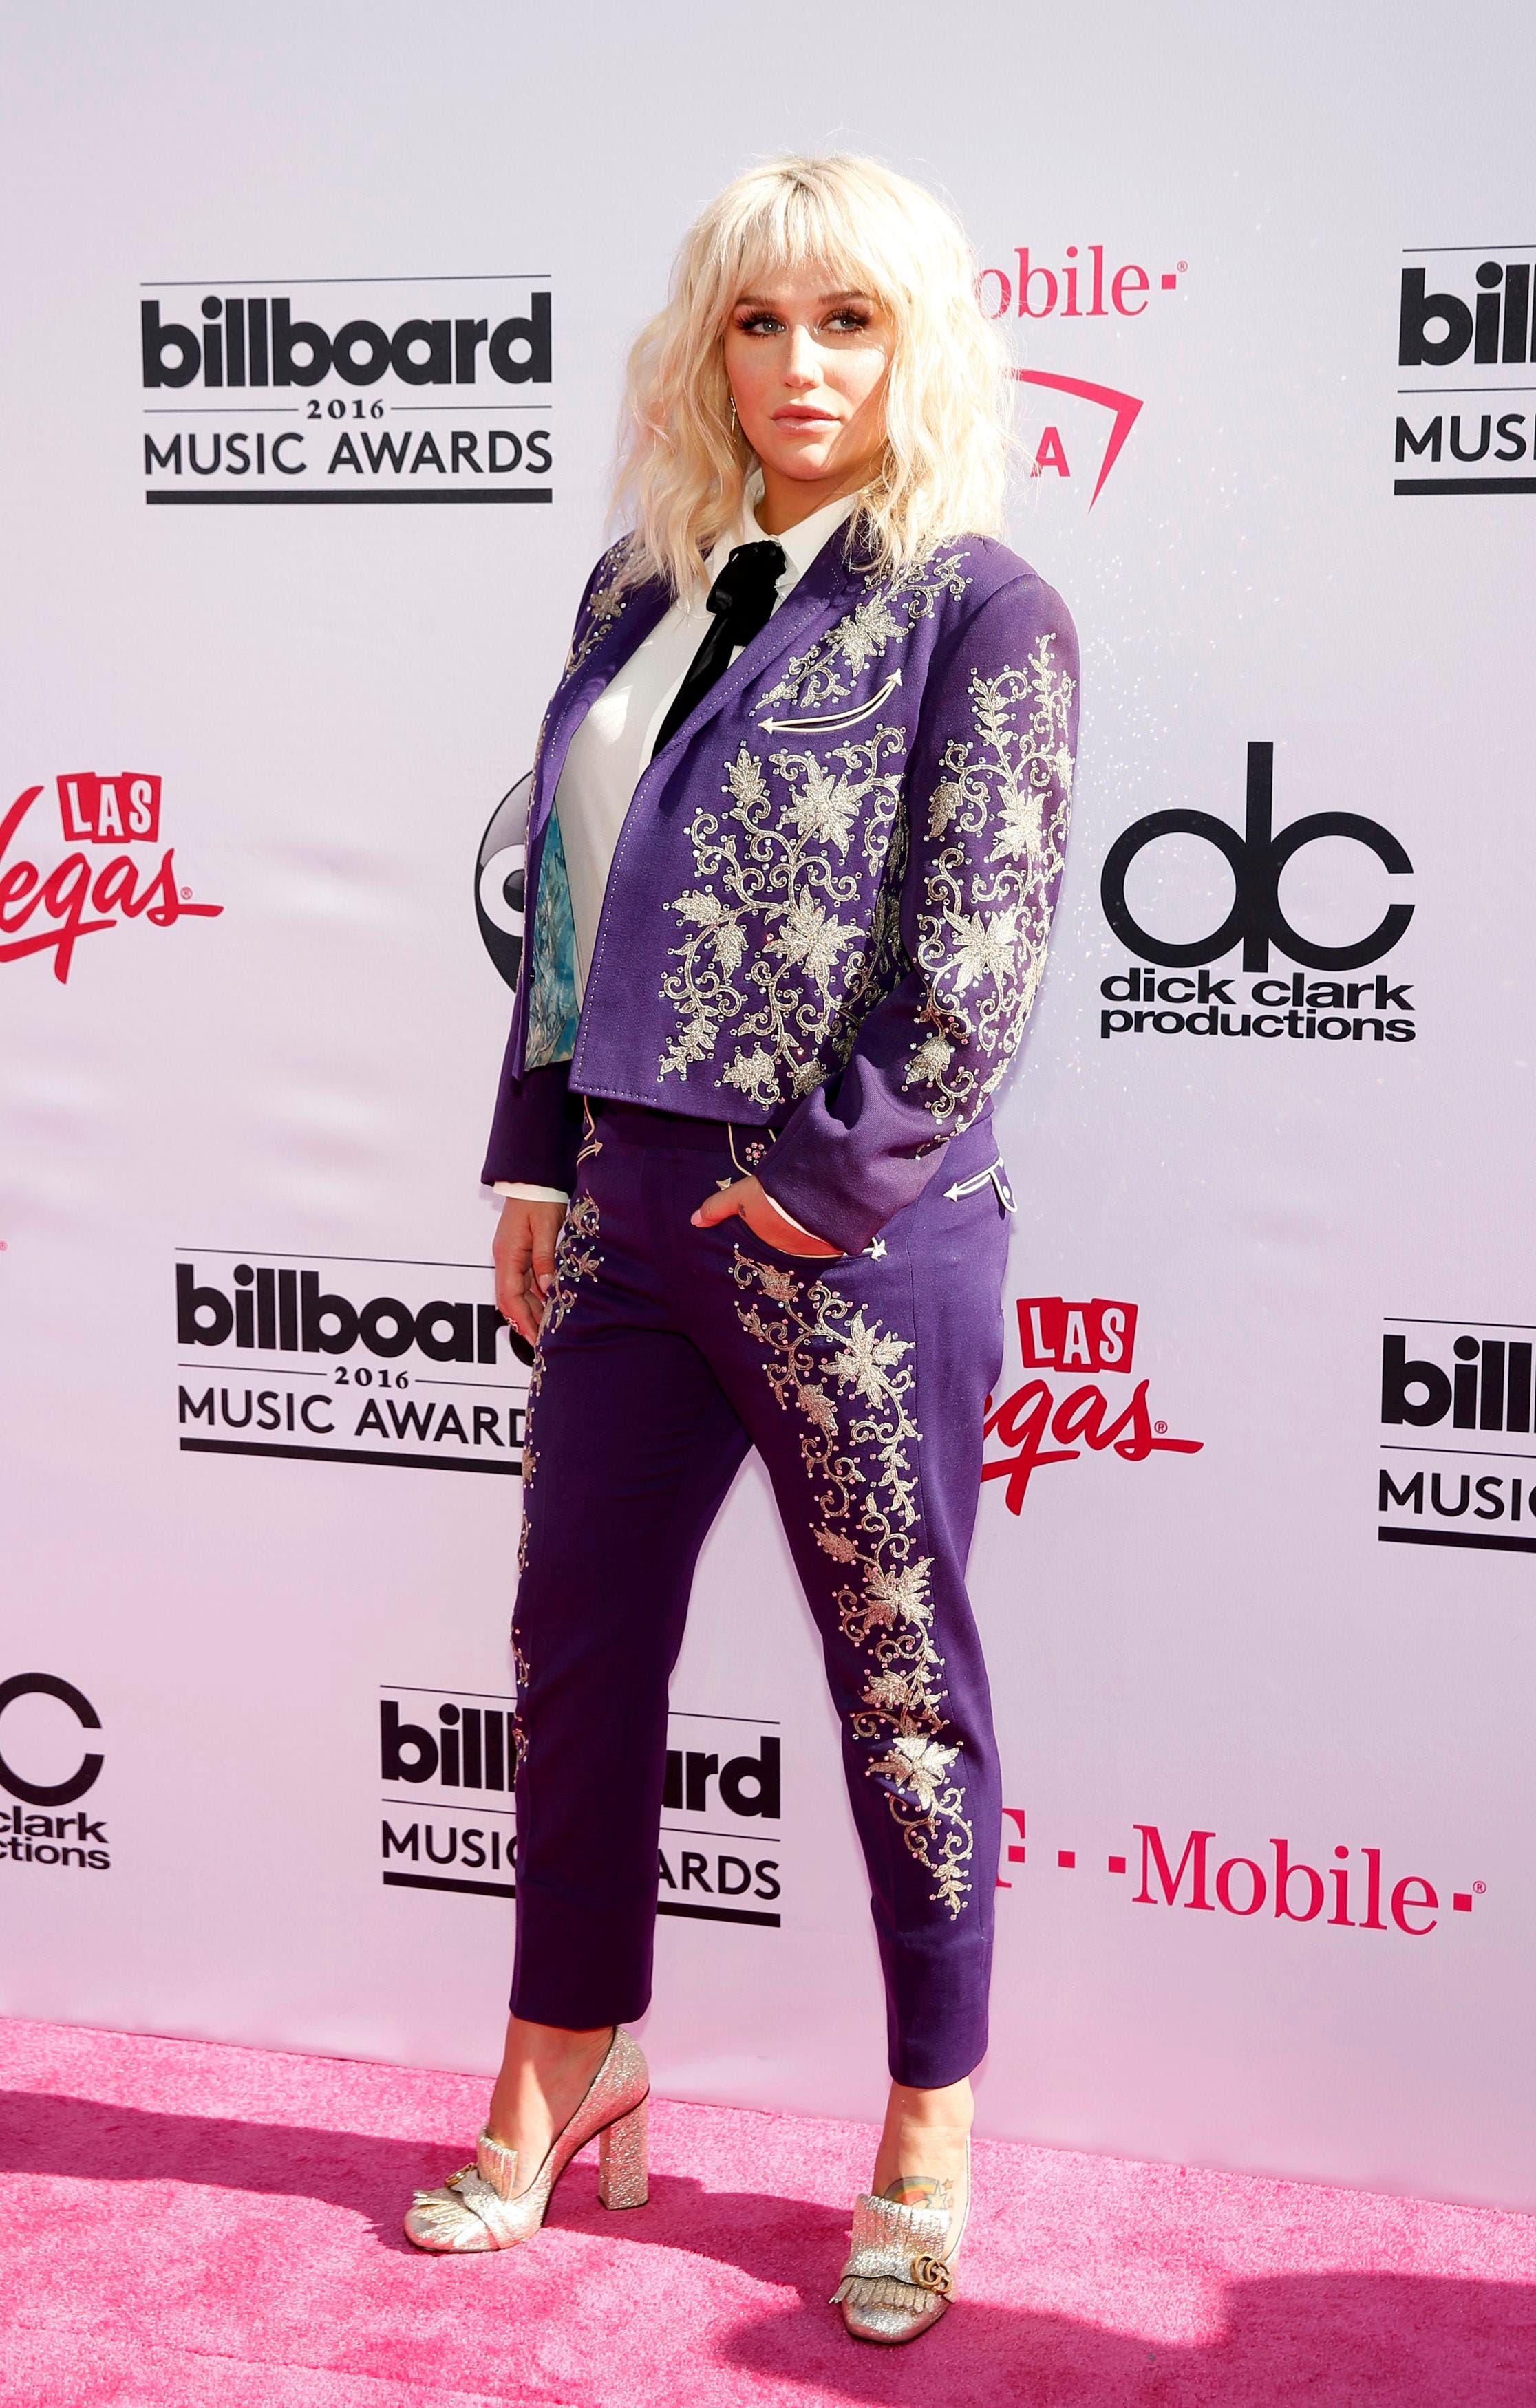 Singer Kesha arrives at the 2016 Billboard Awards in Las Vegas, Nevada, US, May 22, 2016. (Reuters)